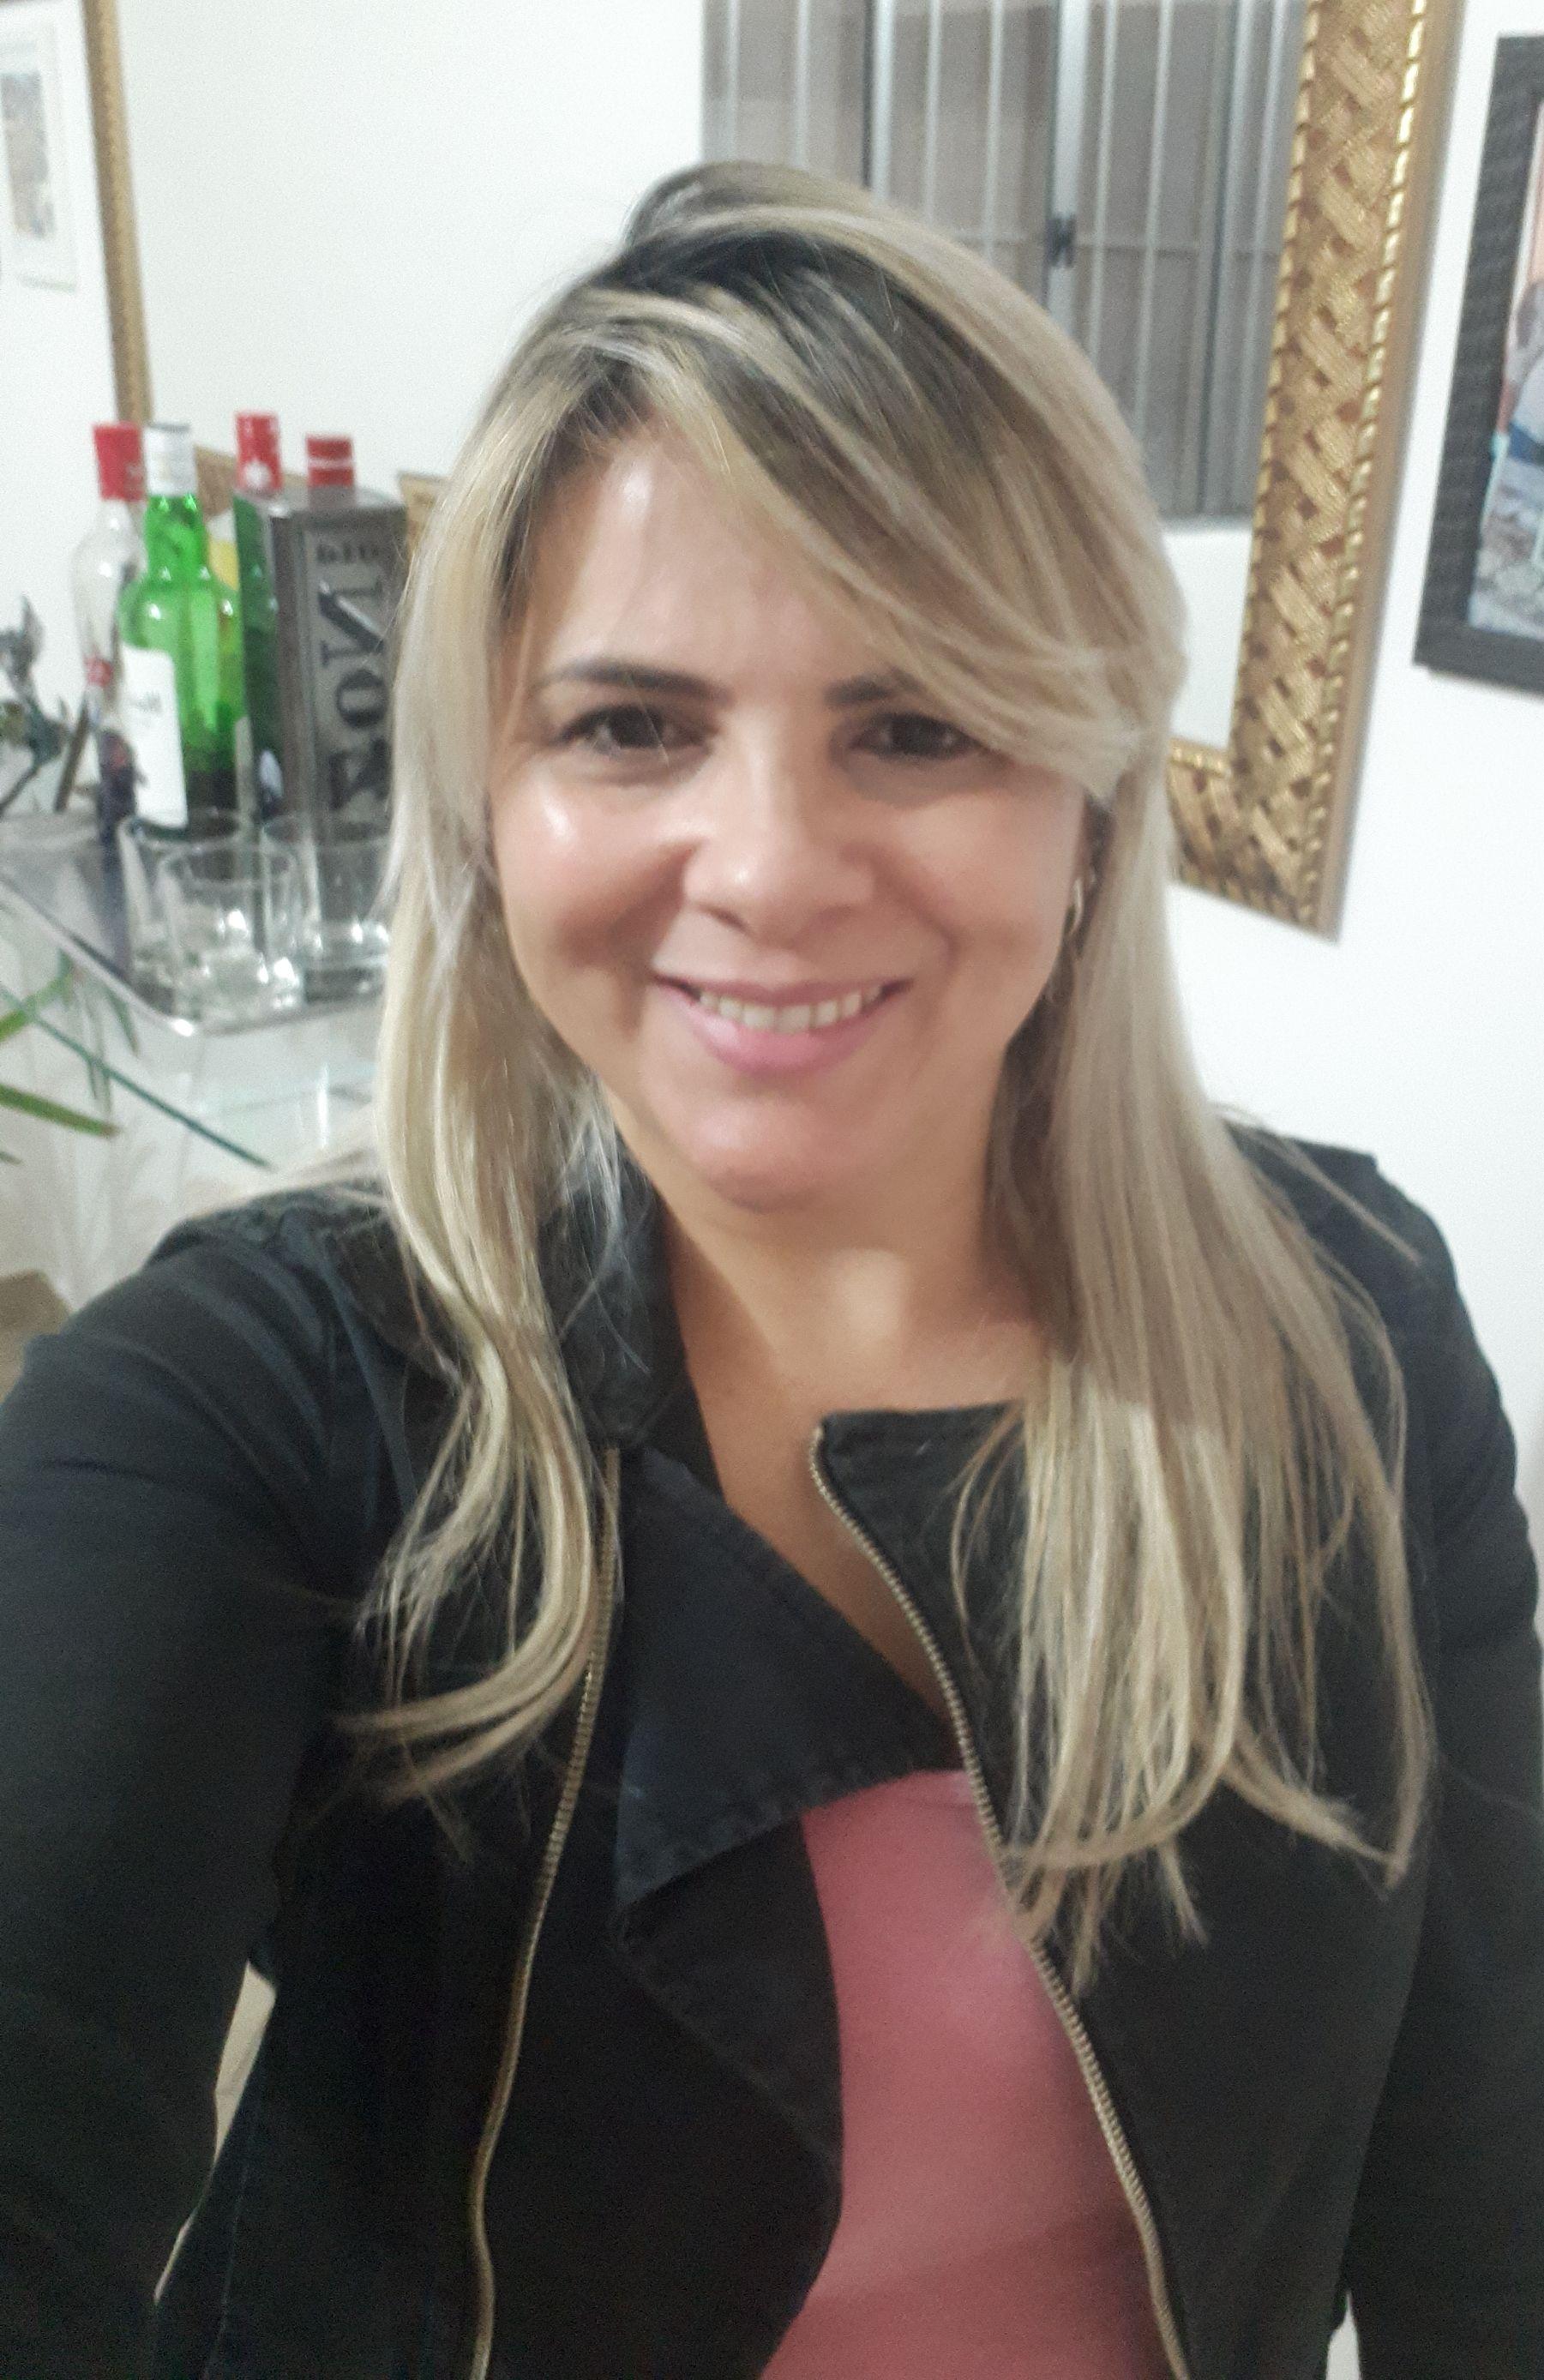 Roseli Toledo Sobre o Carreira Beauty